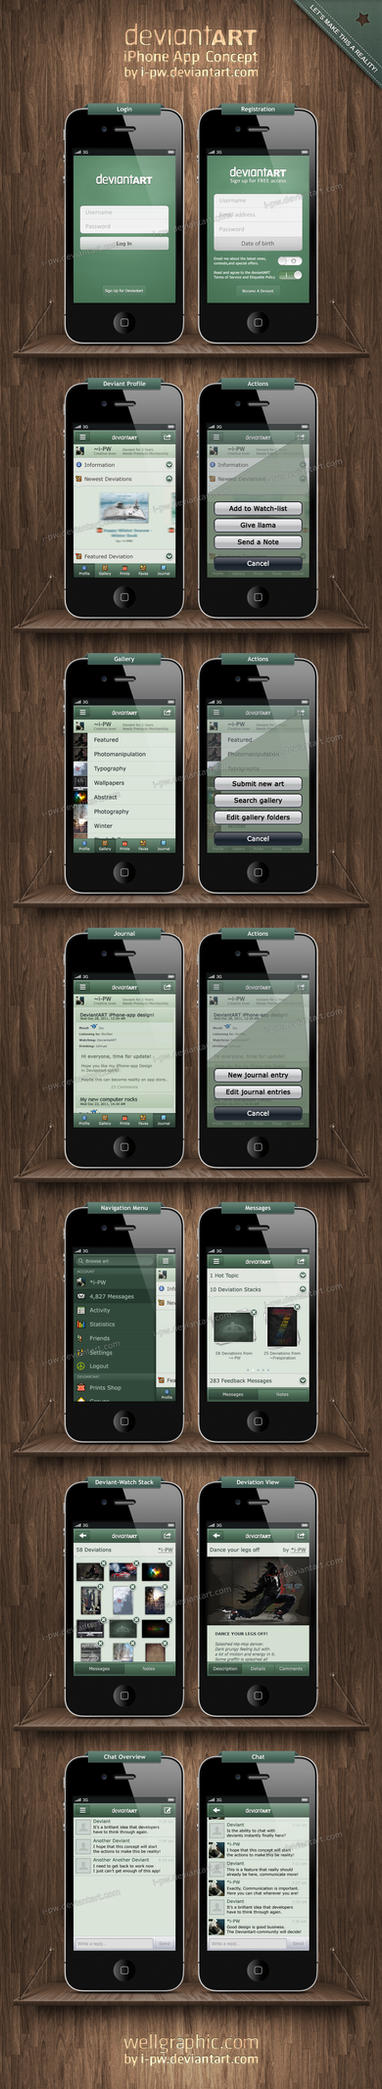 Deviantart iPhone App Concept by wellgraphic